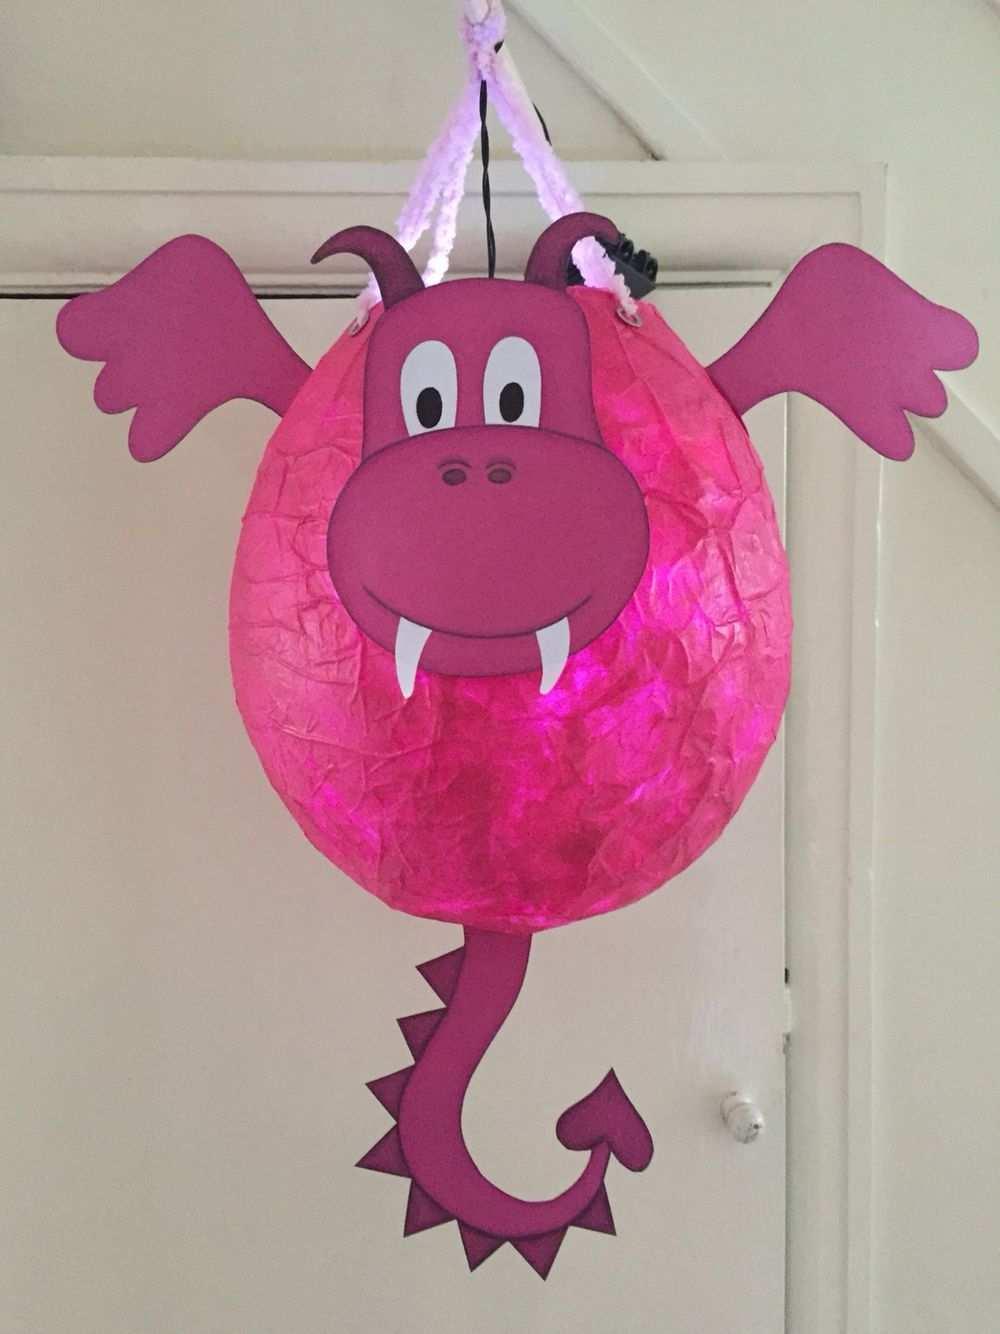 Drachenlaterne Mit Papermache Laterne Basteln Luftballon Laternen Basteln Drachen Basteln